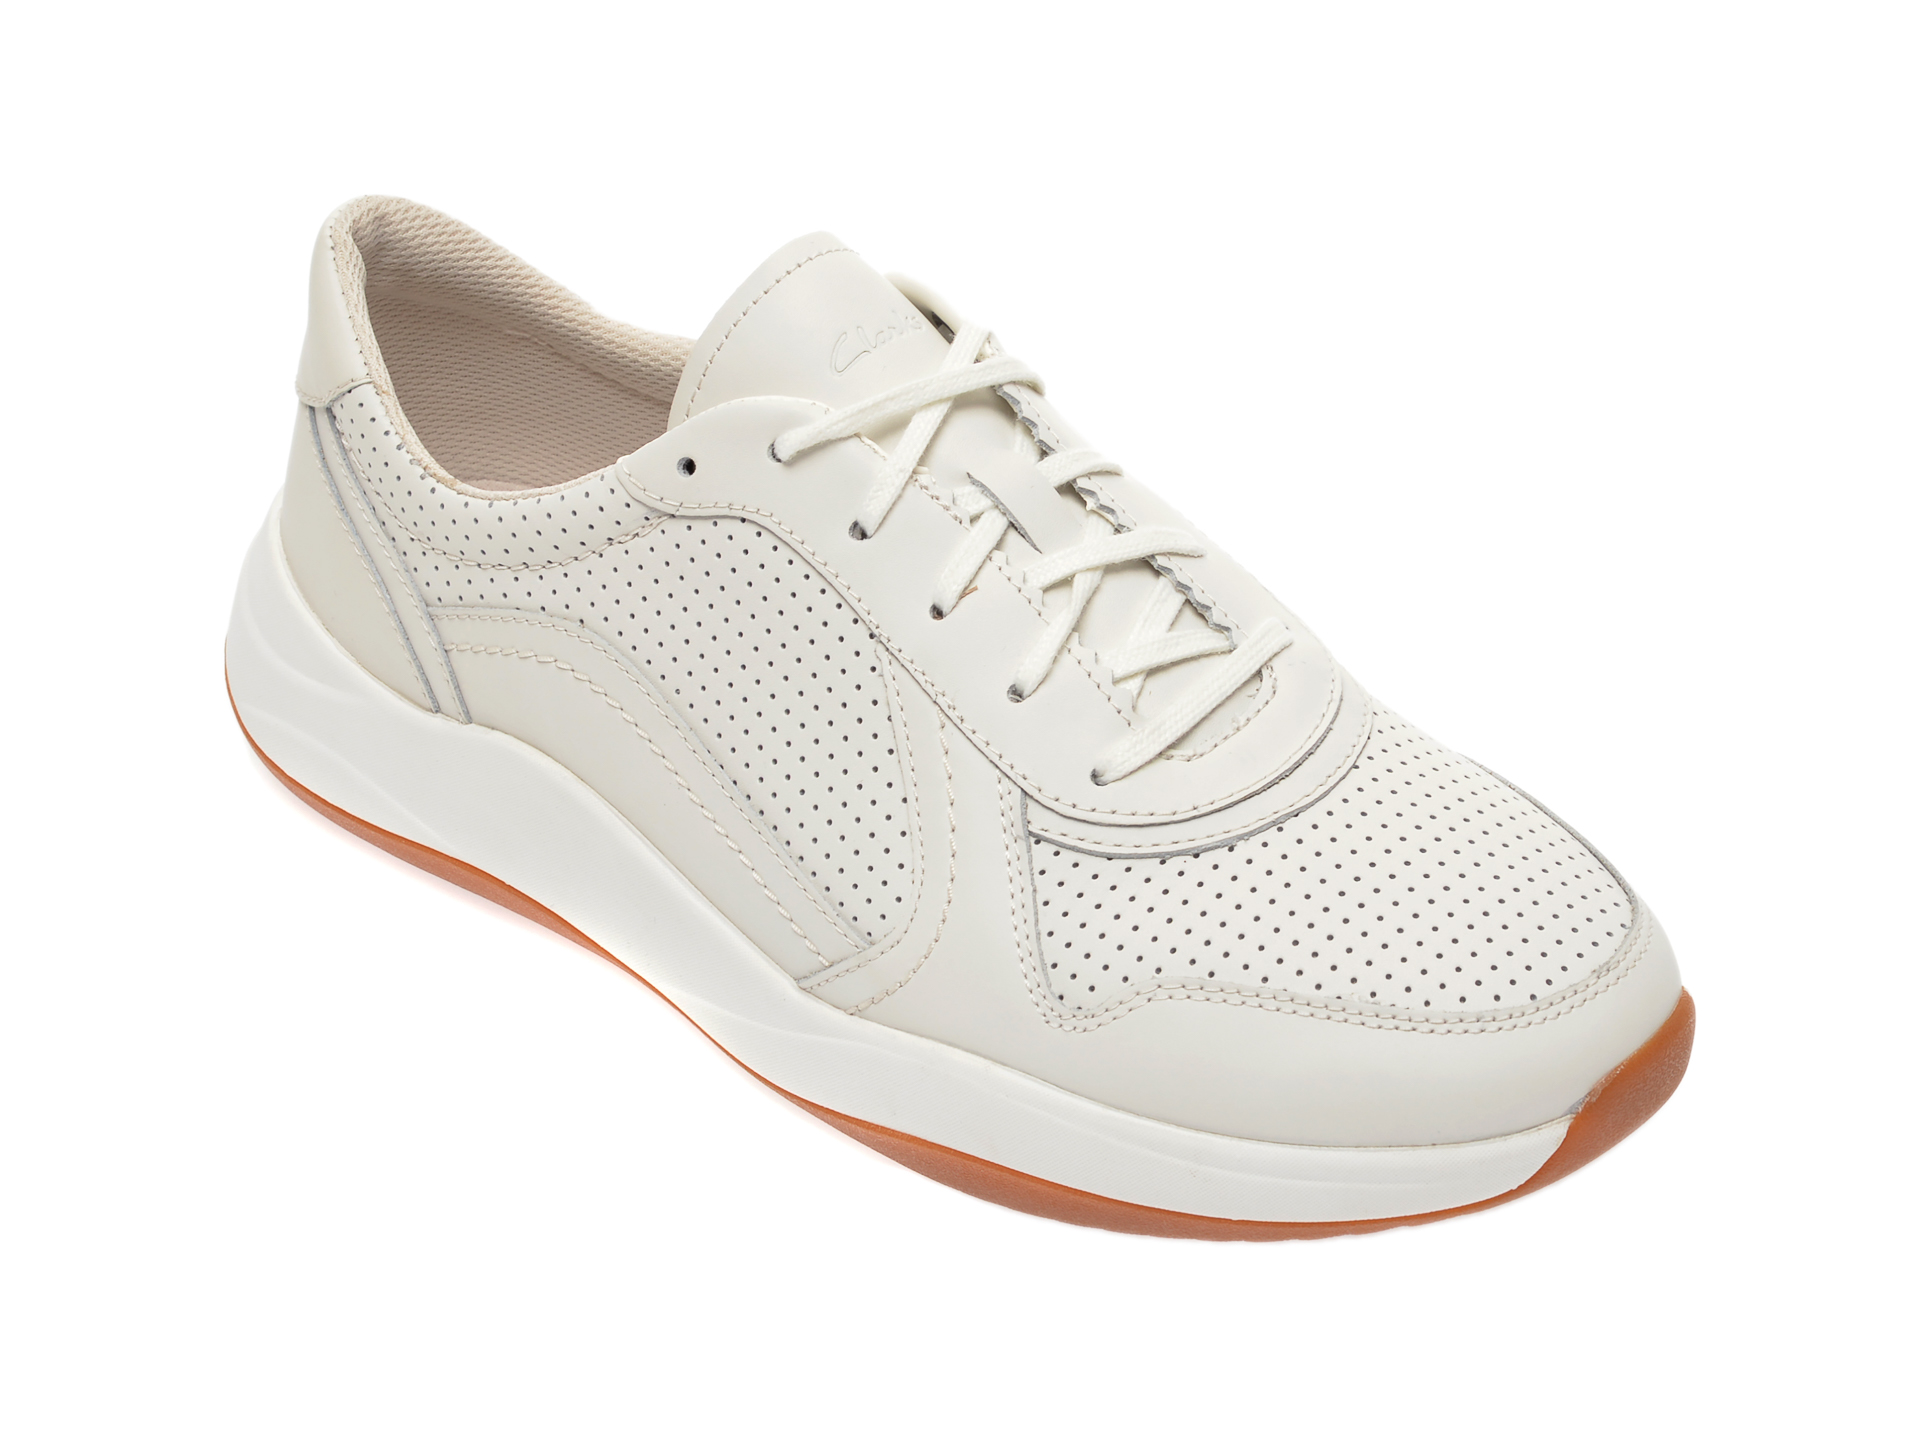 Pantofi sport CLARKS albi, Sift Speed, din piele naturala